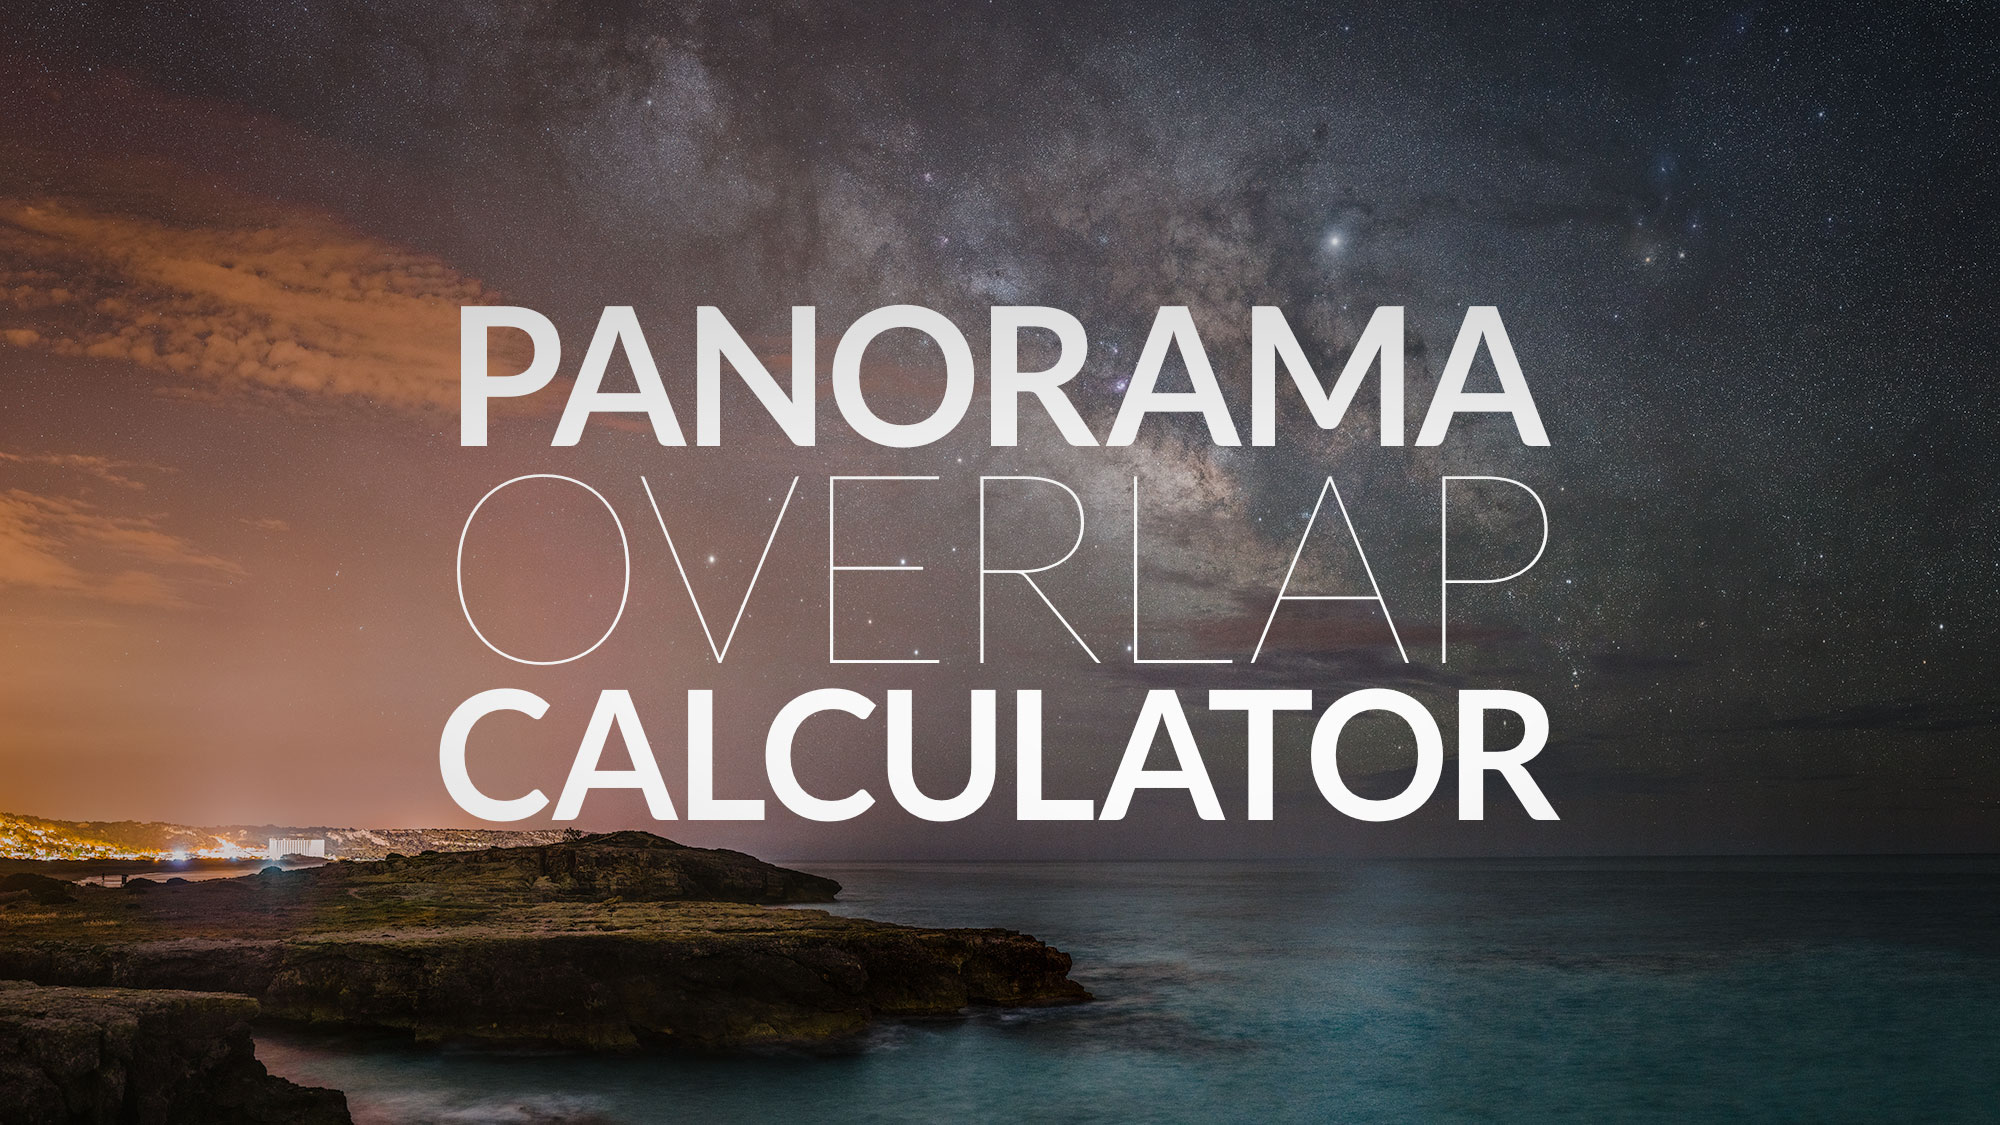 Panorama Overlap Calculator